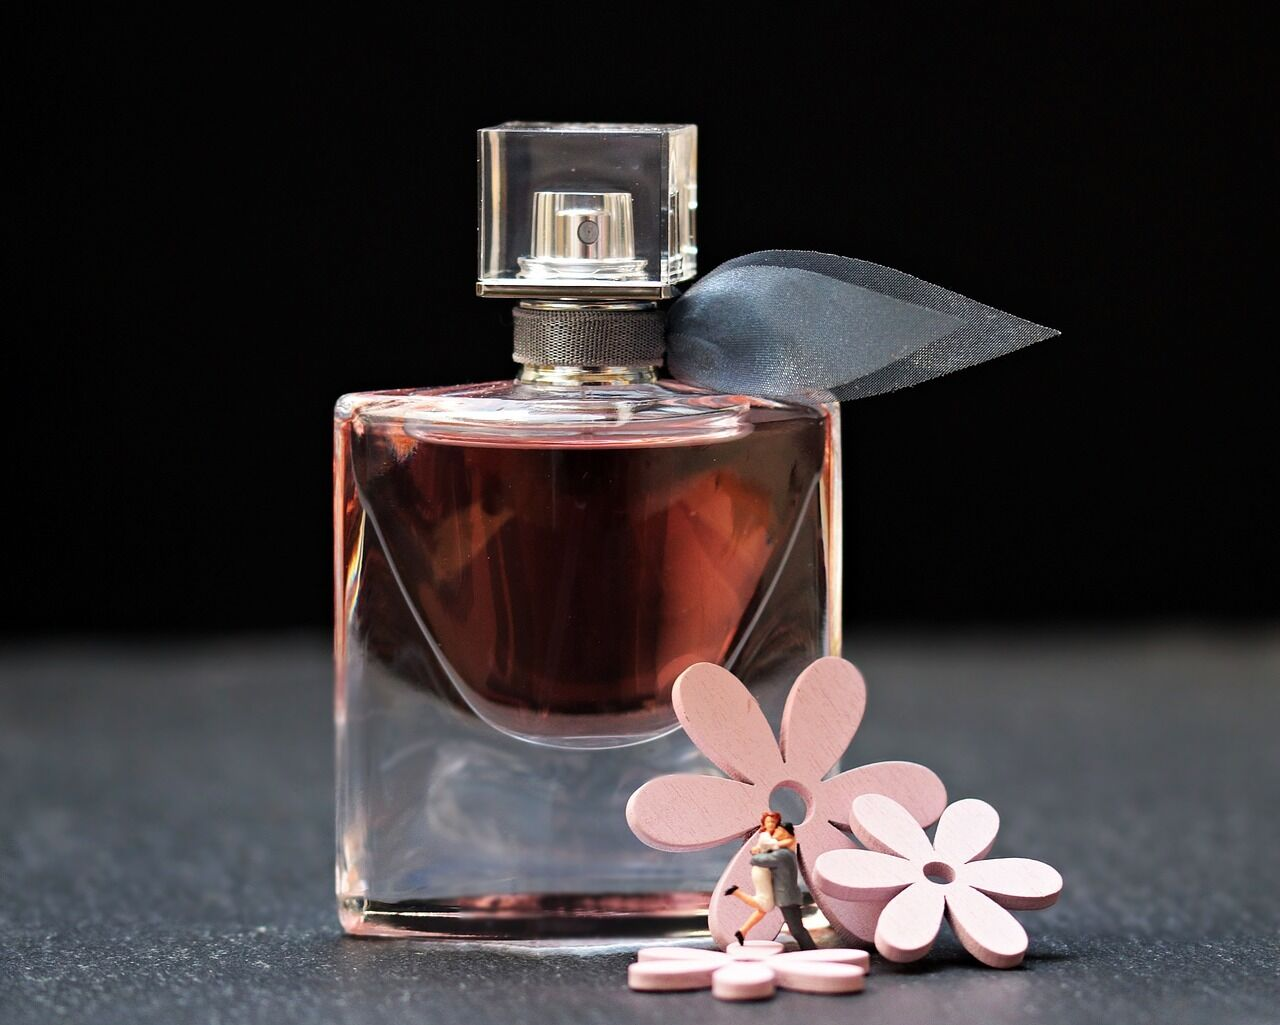 mejor perfume de paco rabanne